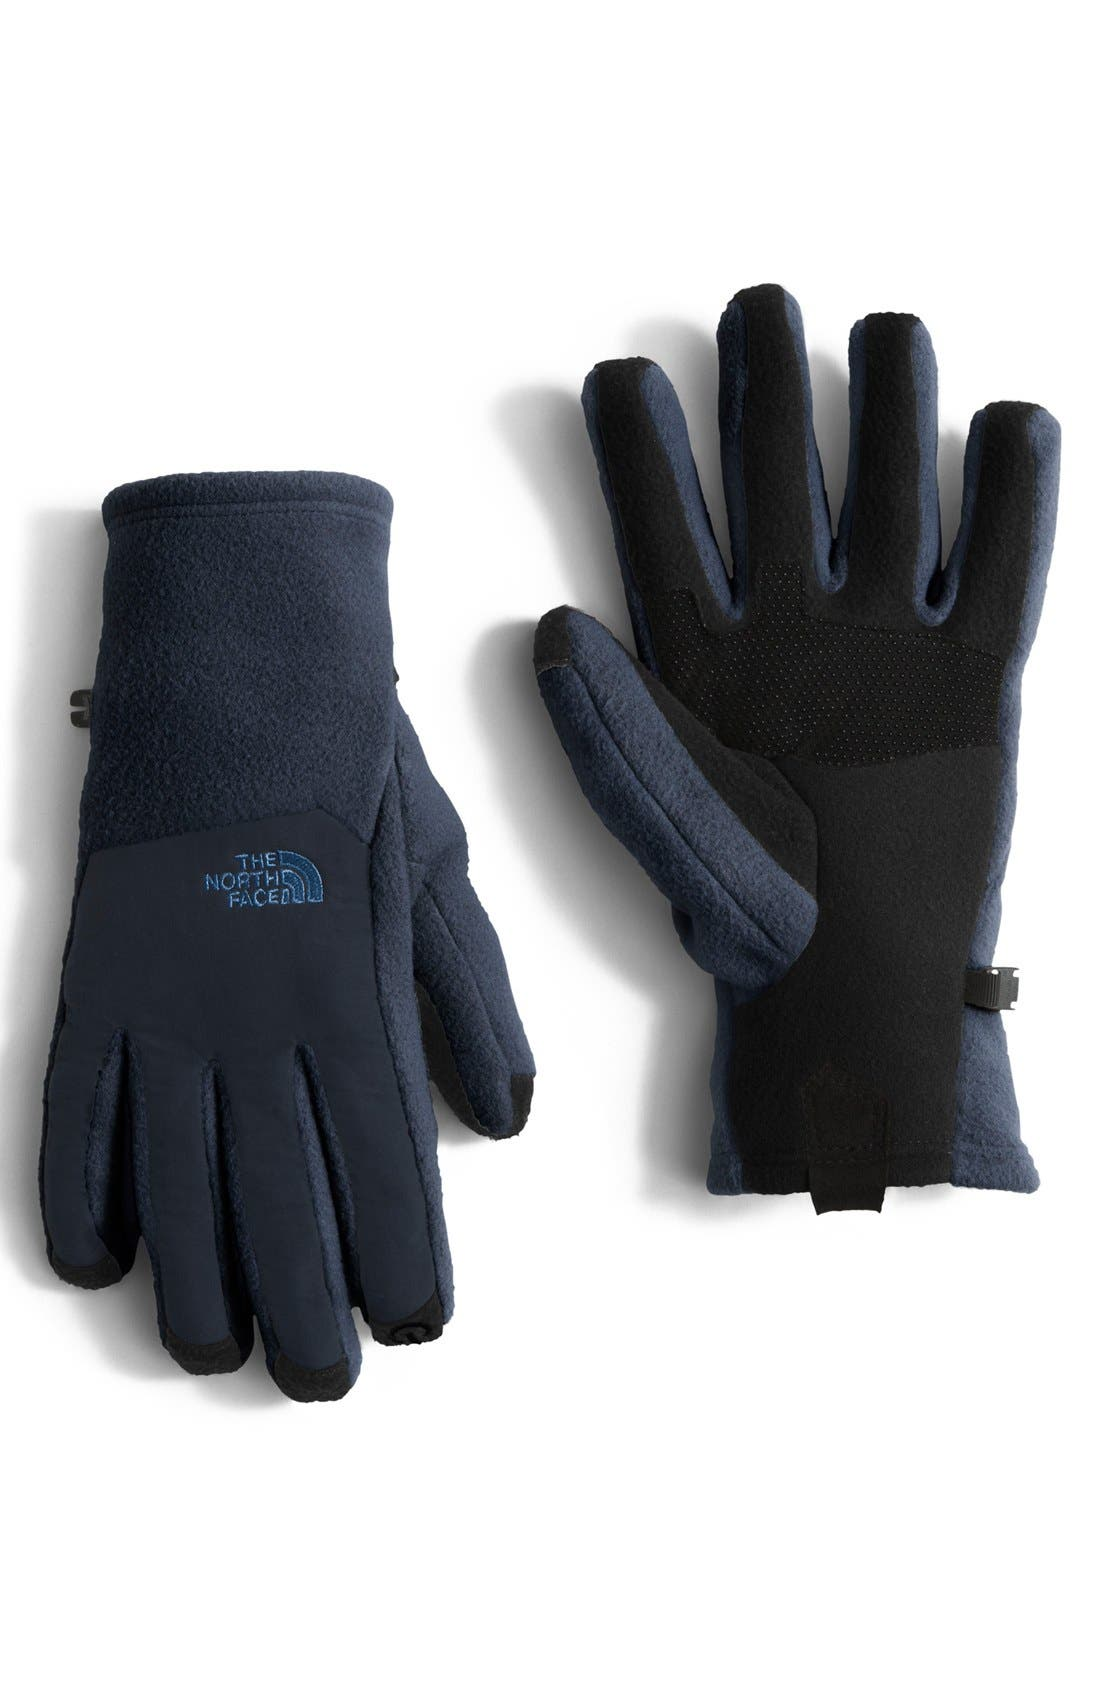 Main Image - The North Face 'Denali' E-Tip Gloves